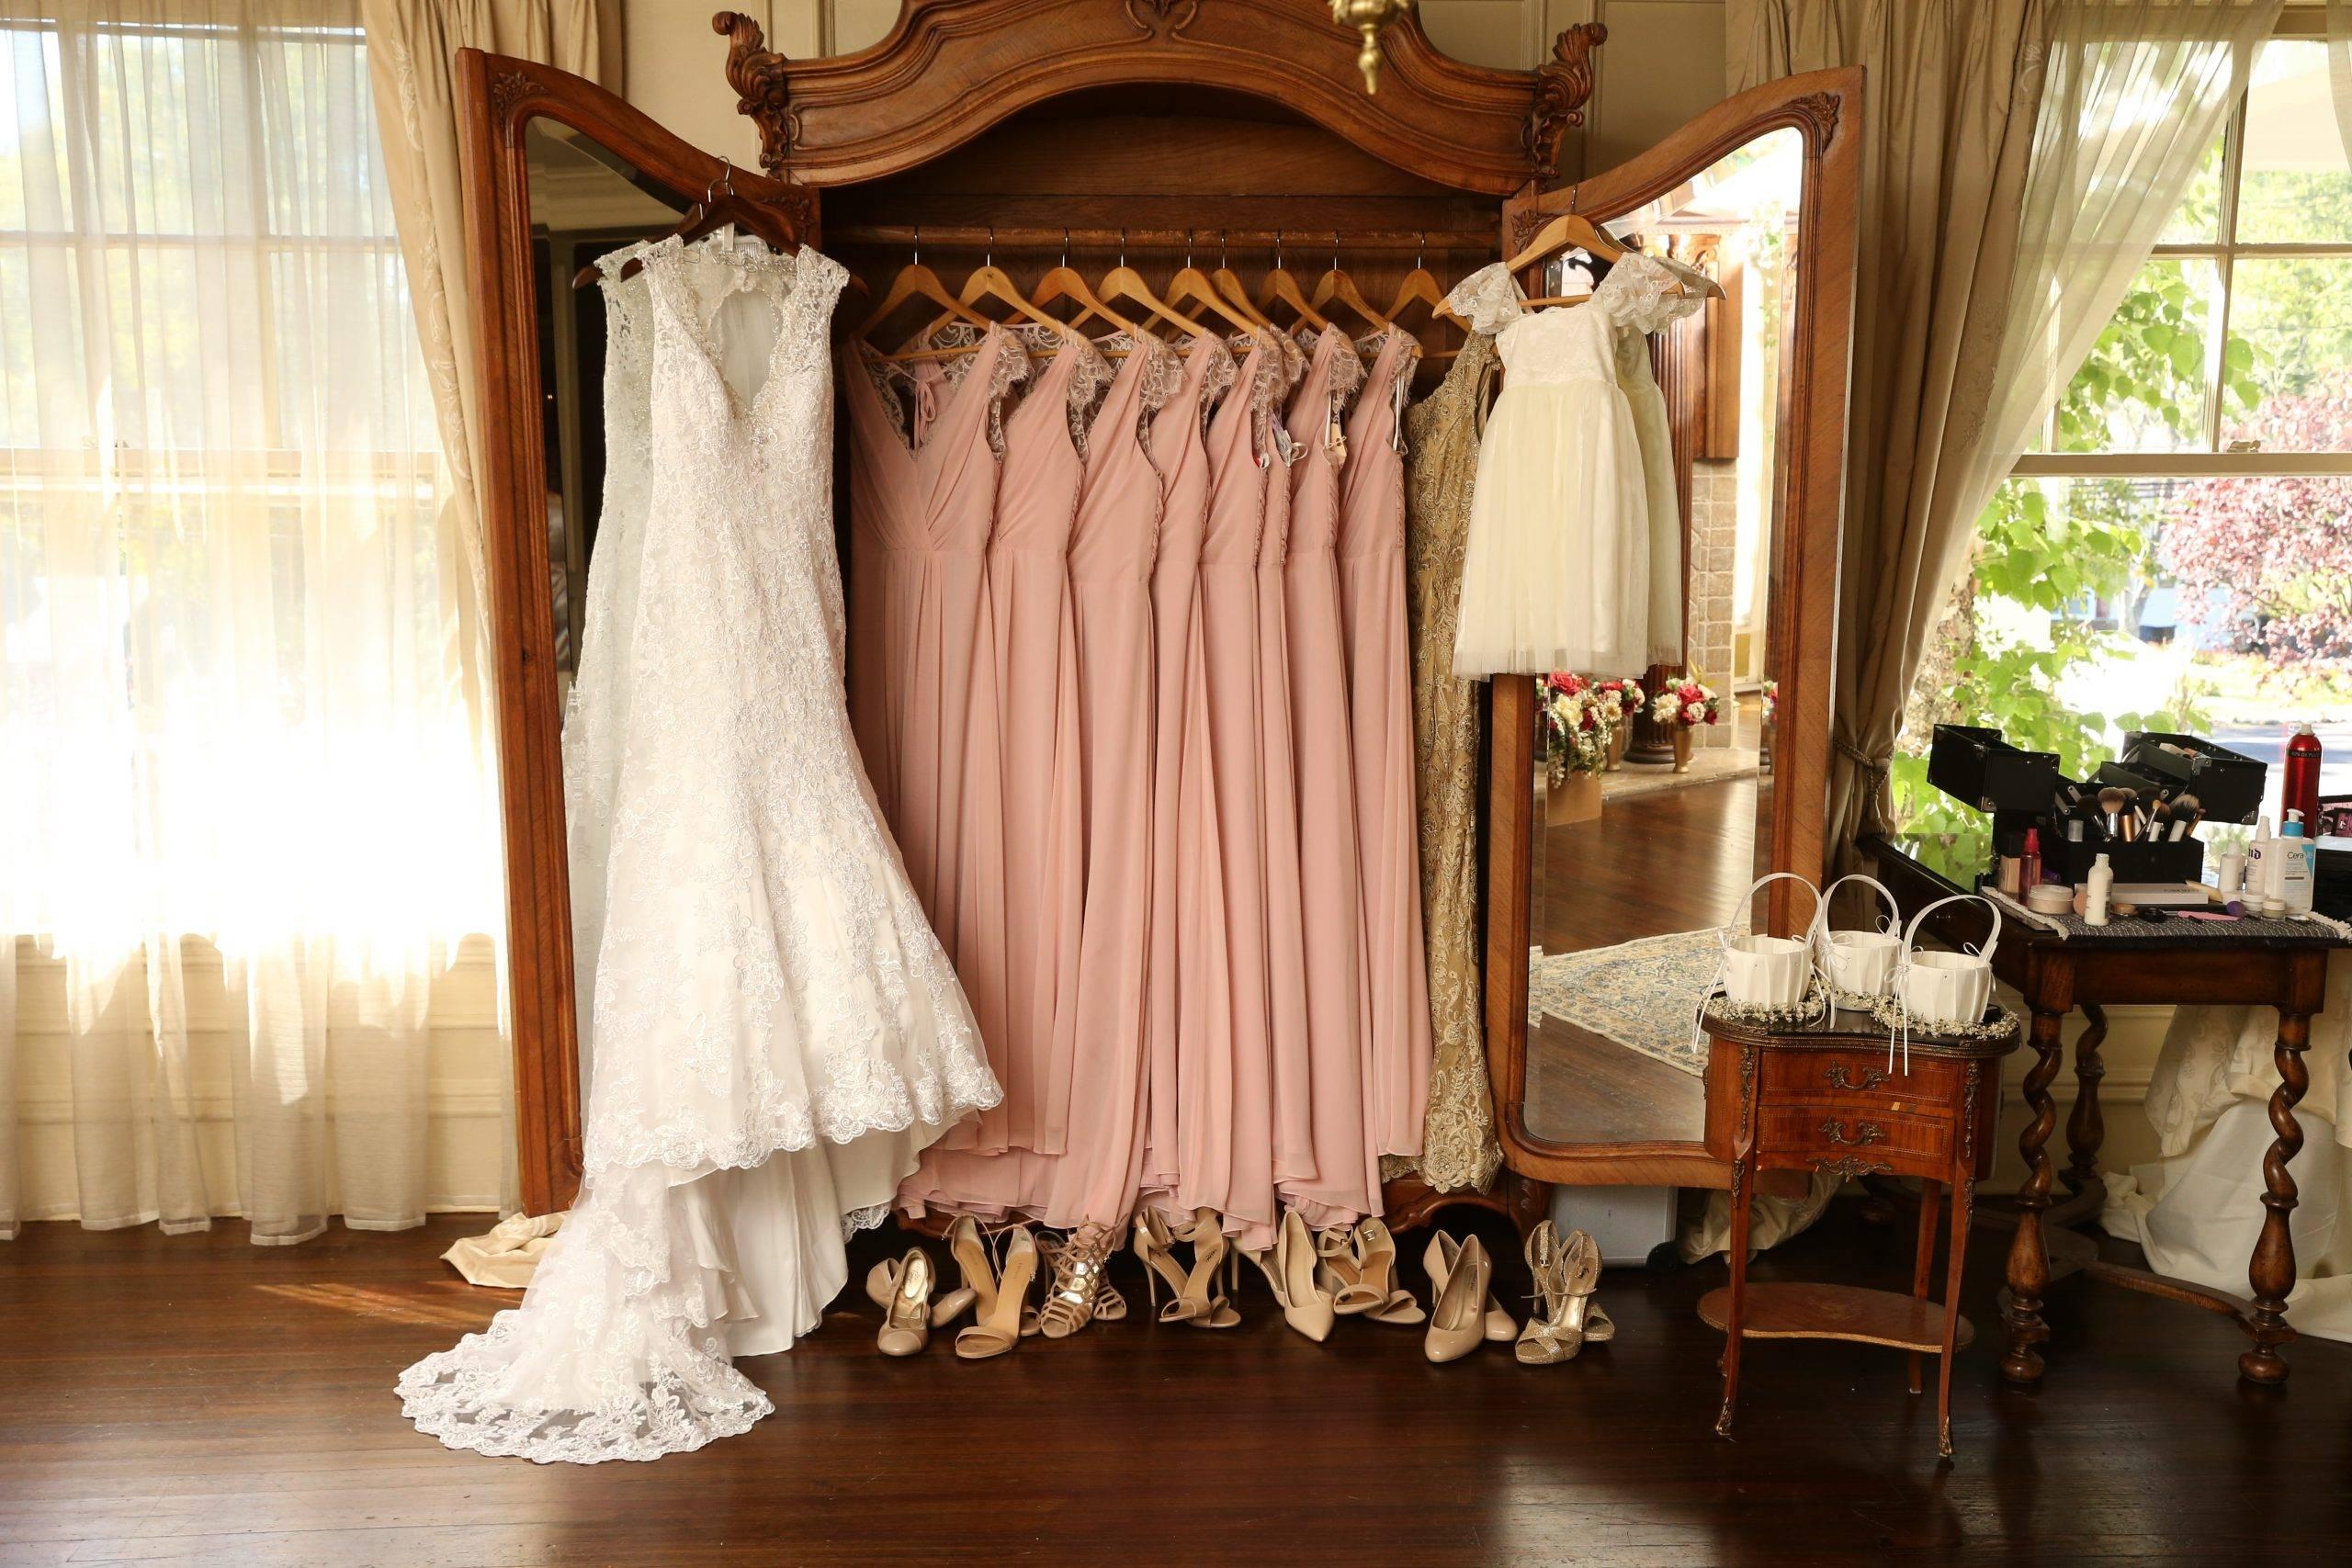 Park Savoy brides and bridesmaids dresses